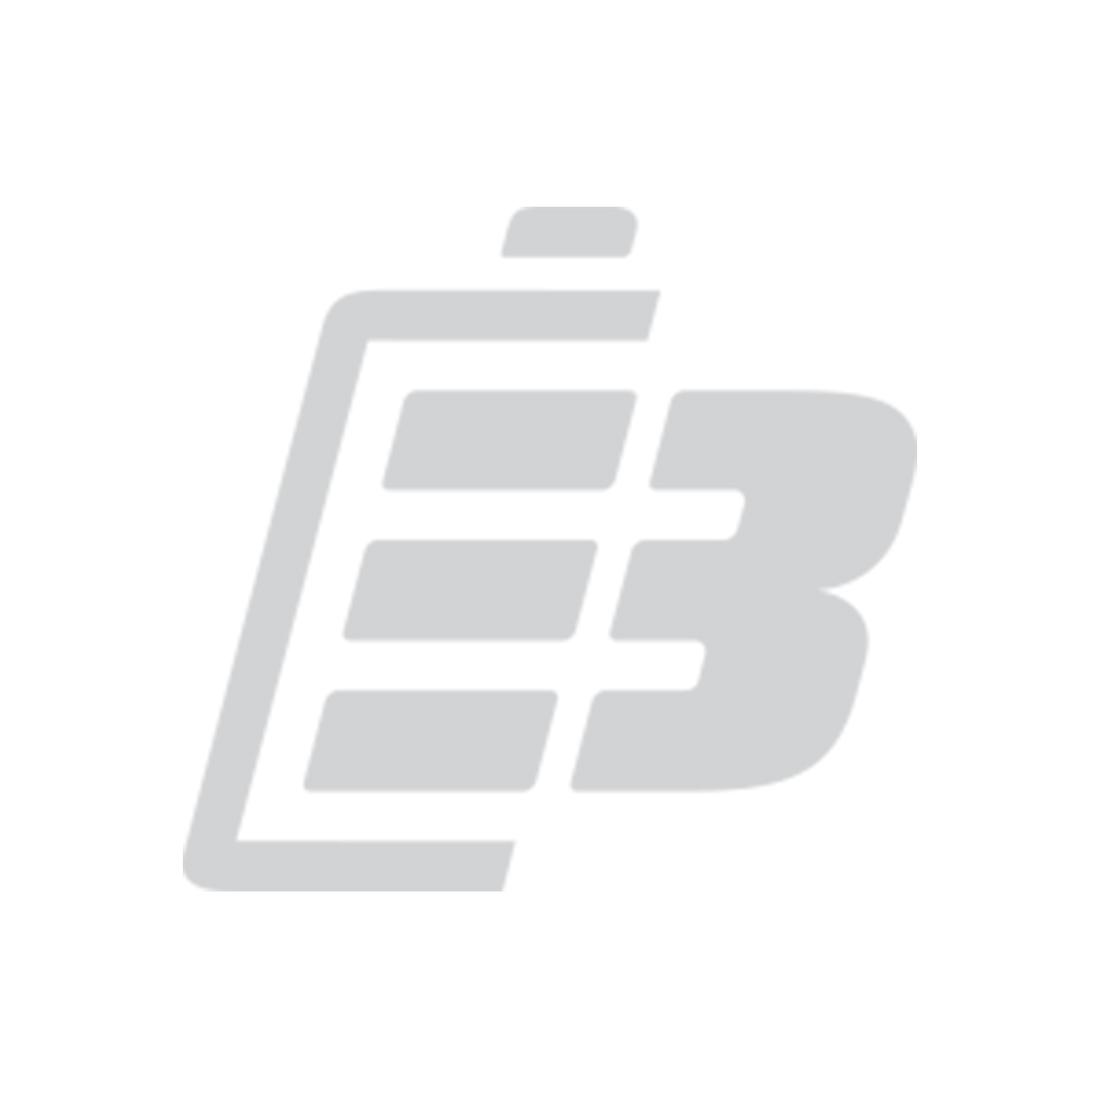 Wireless headset battery Jabra 2010_1